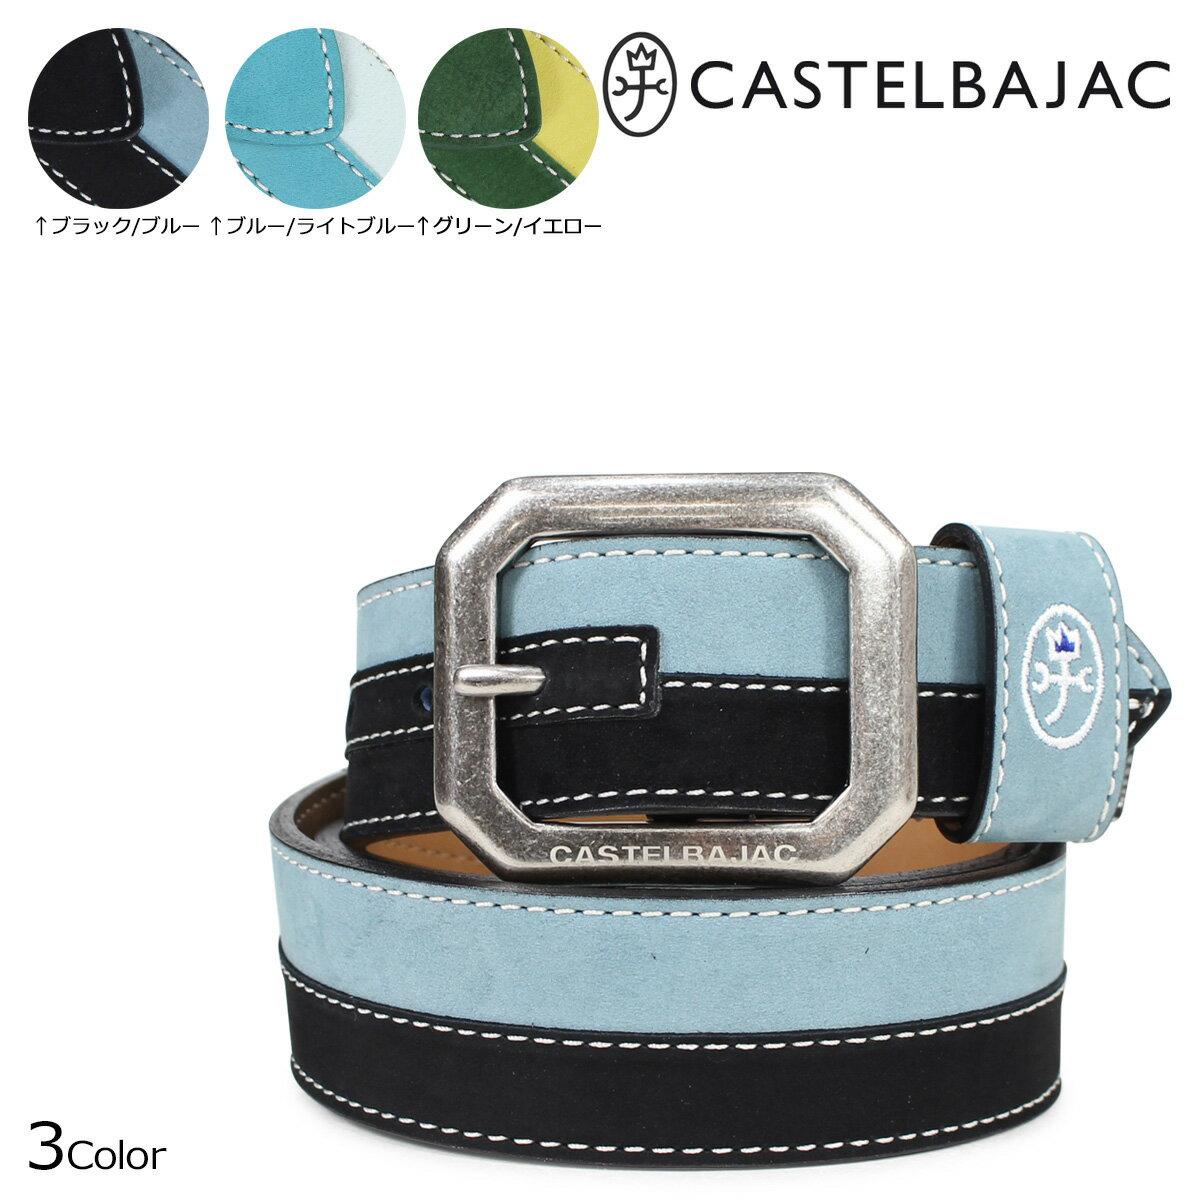 CASTELBAJAC カステルバジャック ベルト メンズ バックル レザー ブラック ブルー イエロー 23602315